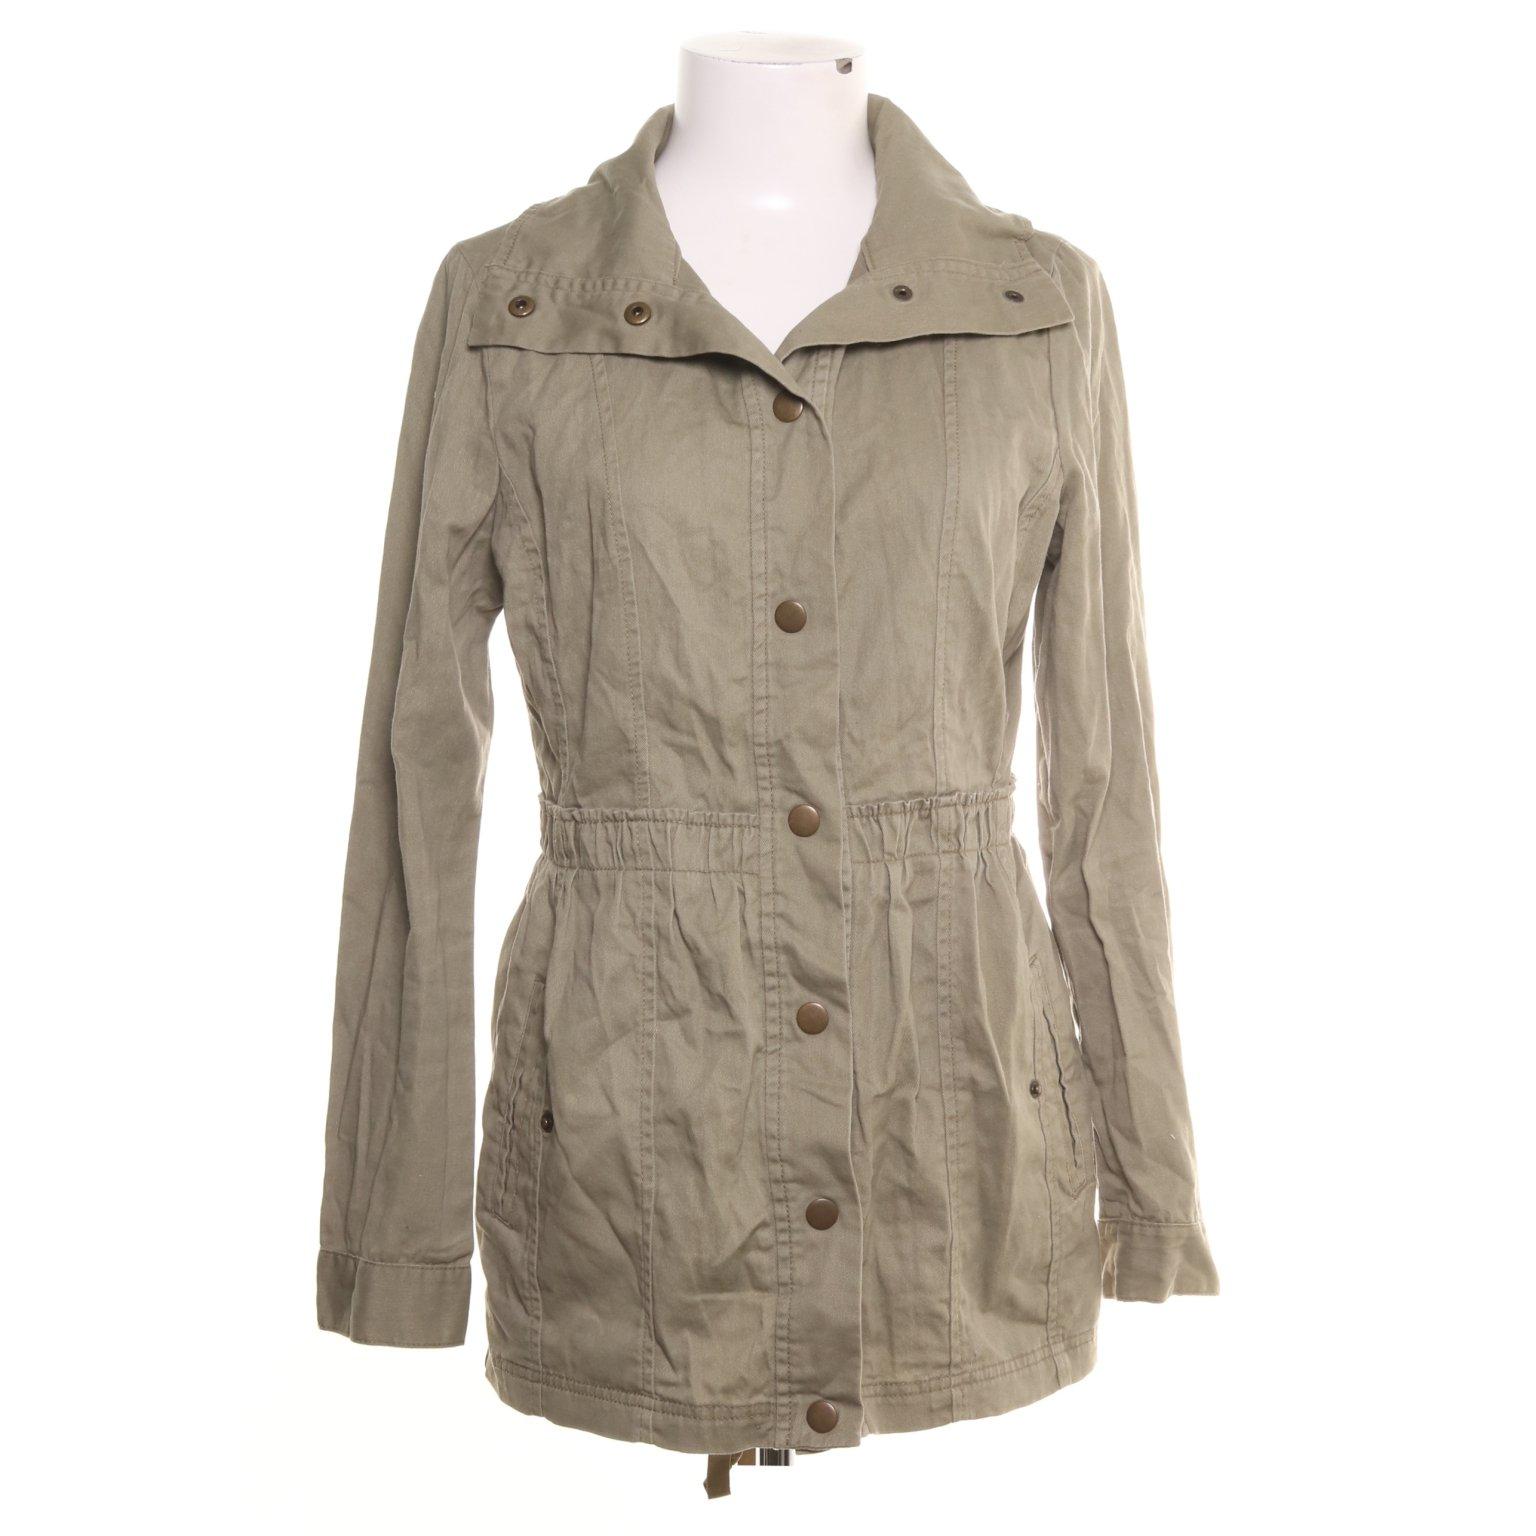 vero moda grön jacka